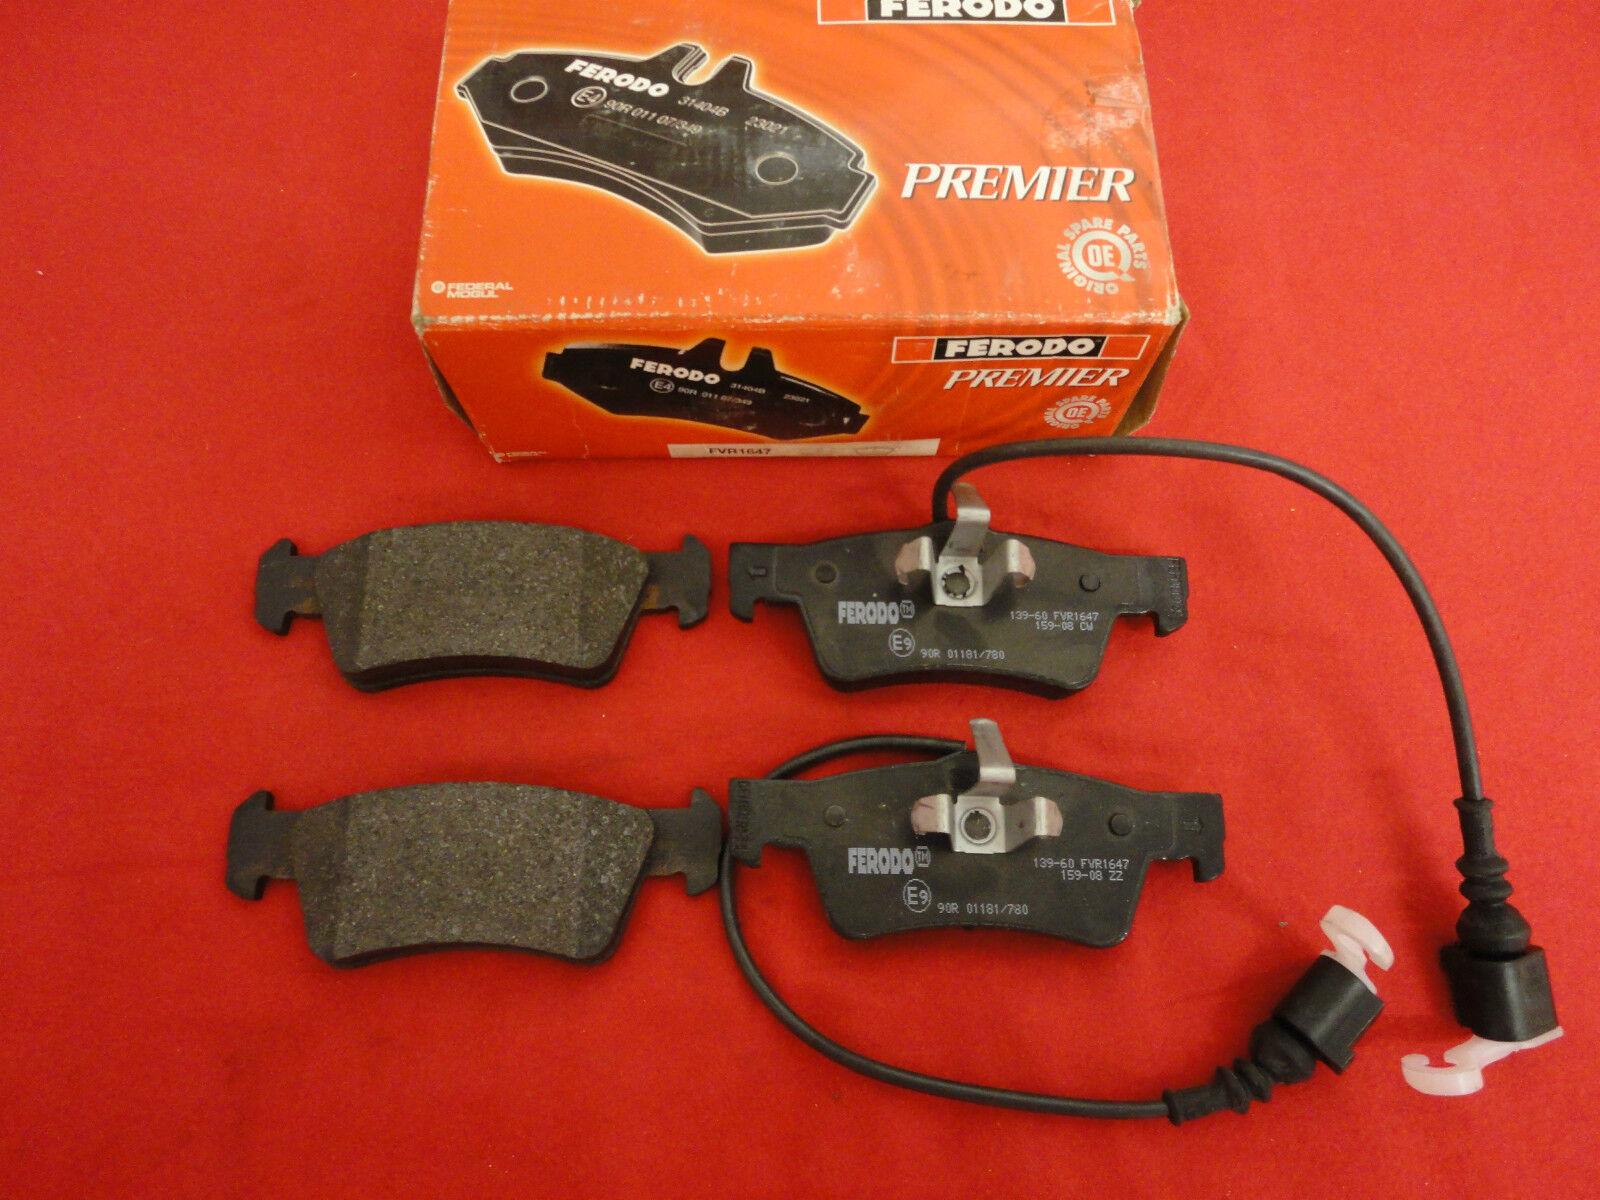 NEU Bremsbelag Ferodo Premier FVR1647 VW T5 7H8698451 7L6698451 7L6698451C